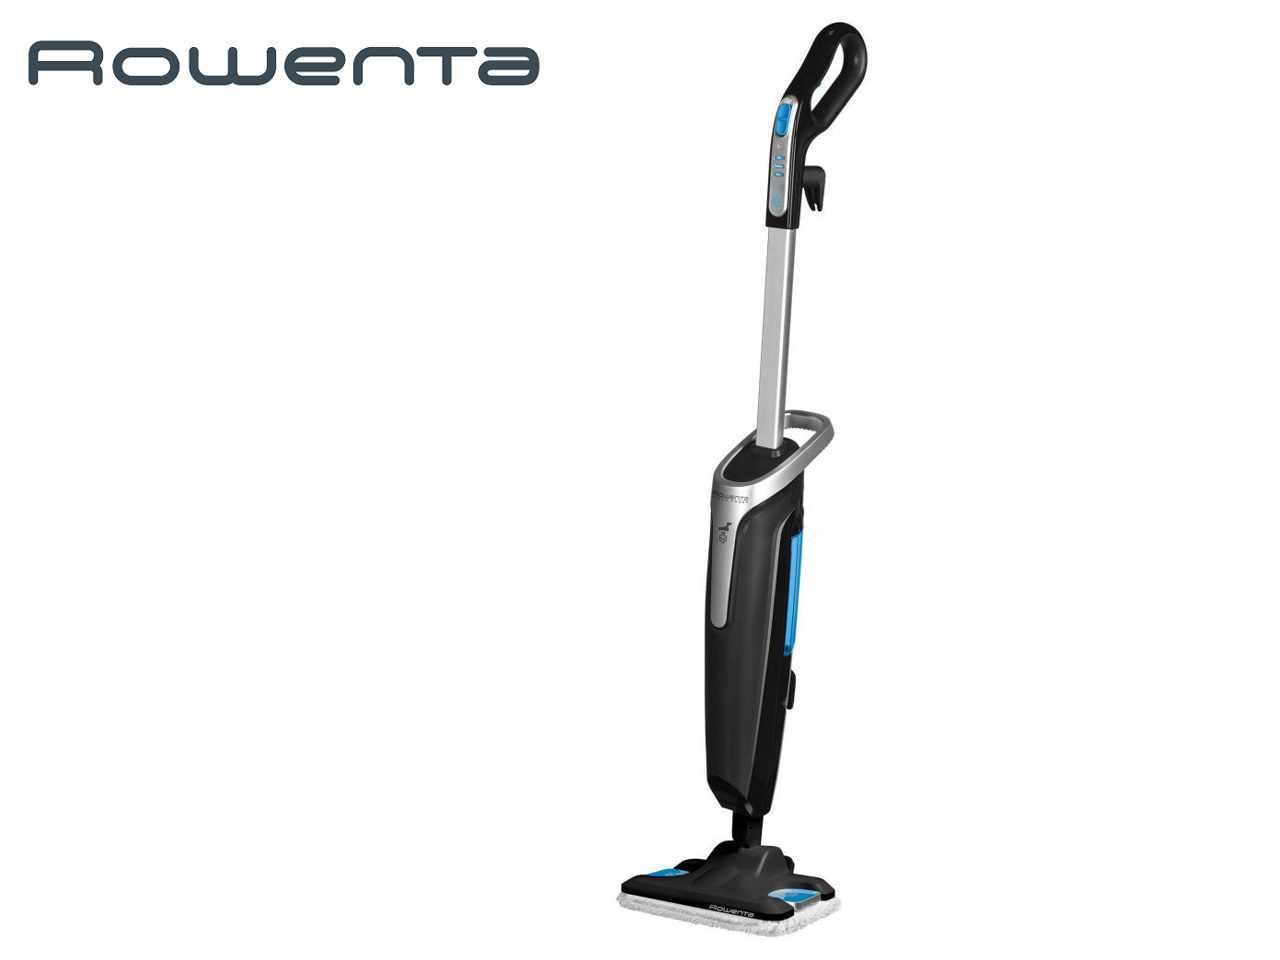 ROWENTA RY6555WH Steam Power Extreme Brush